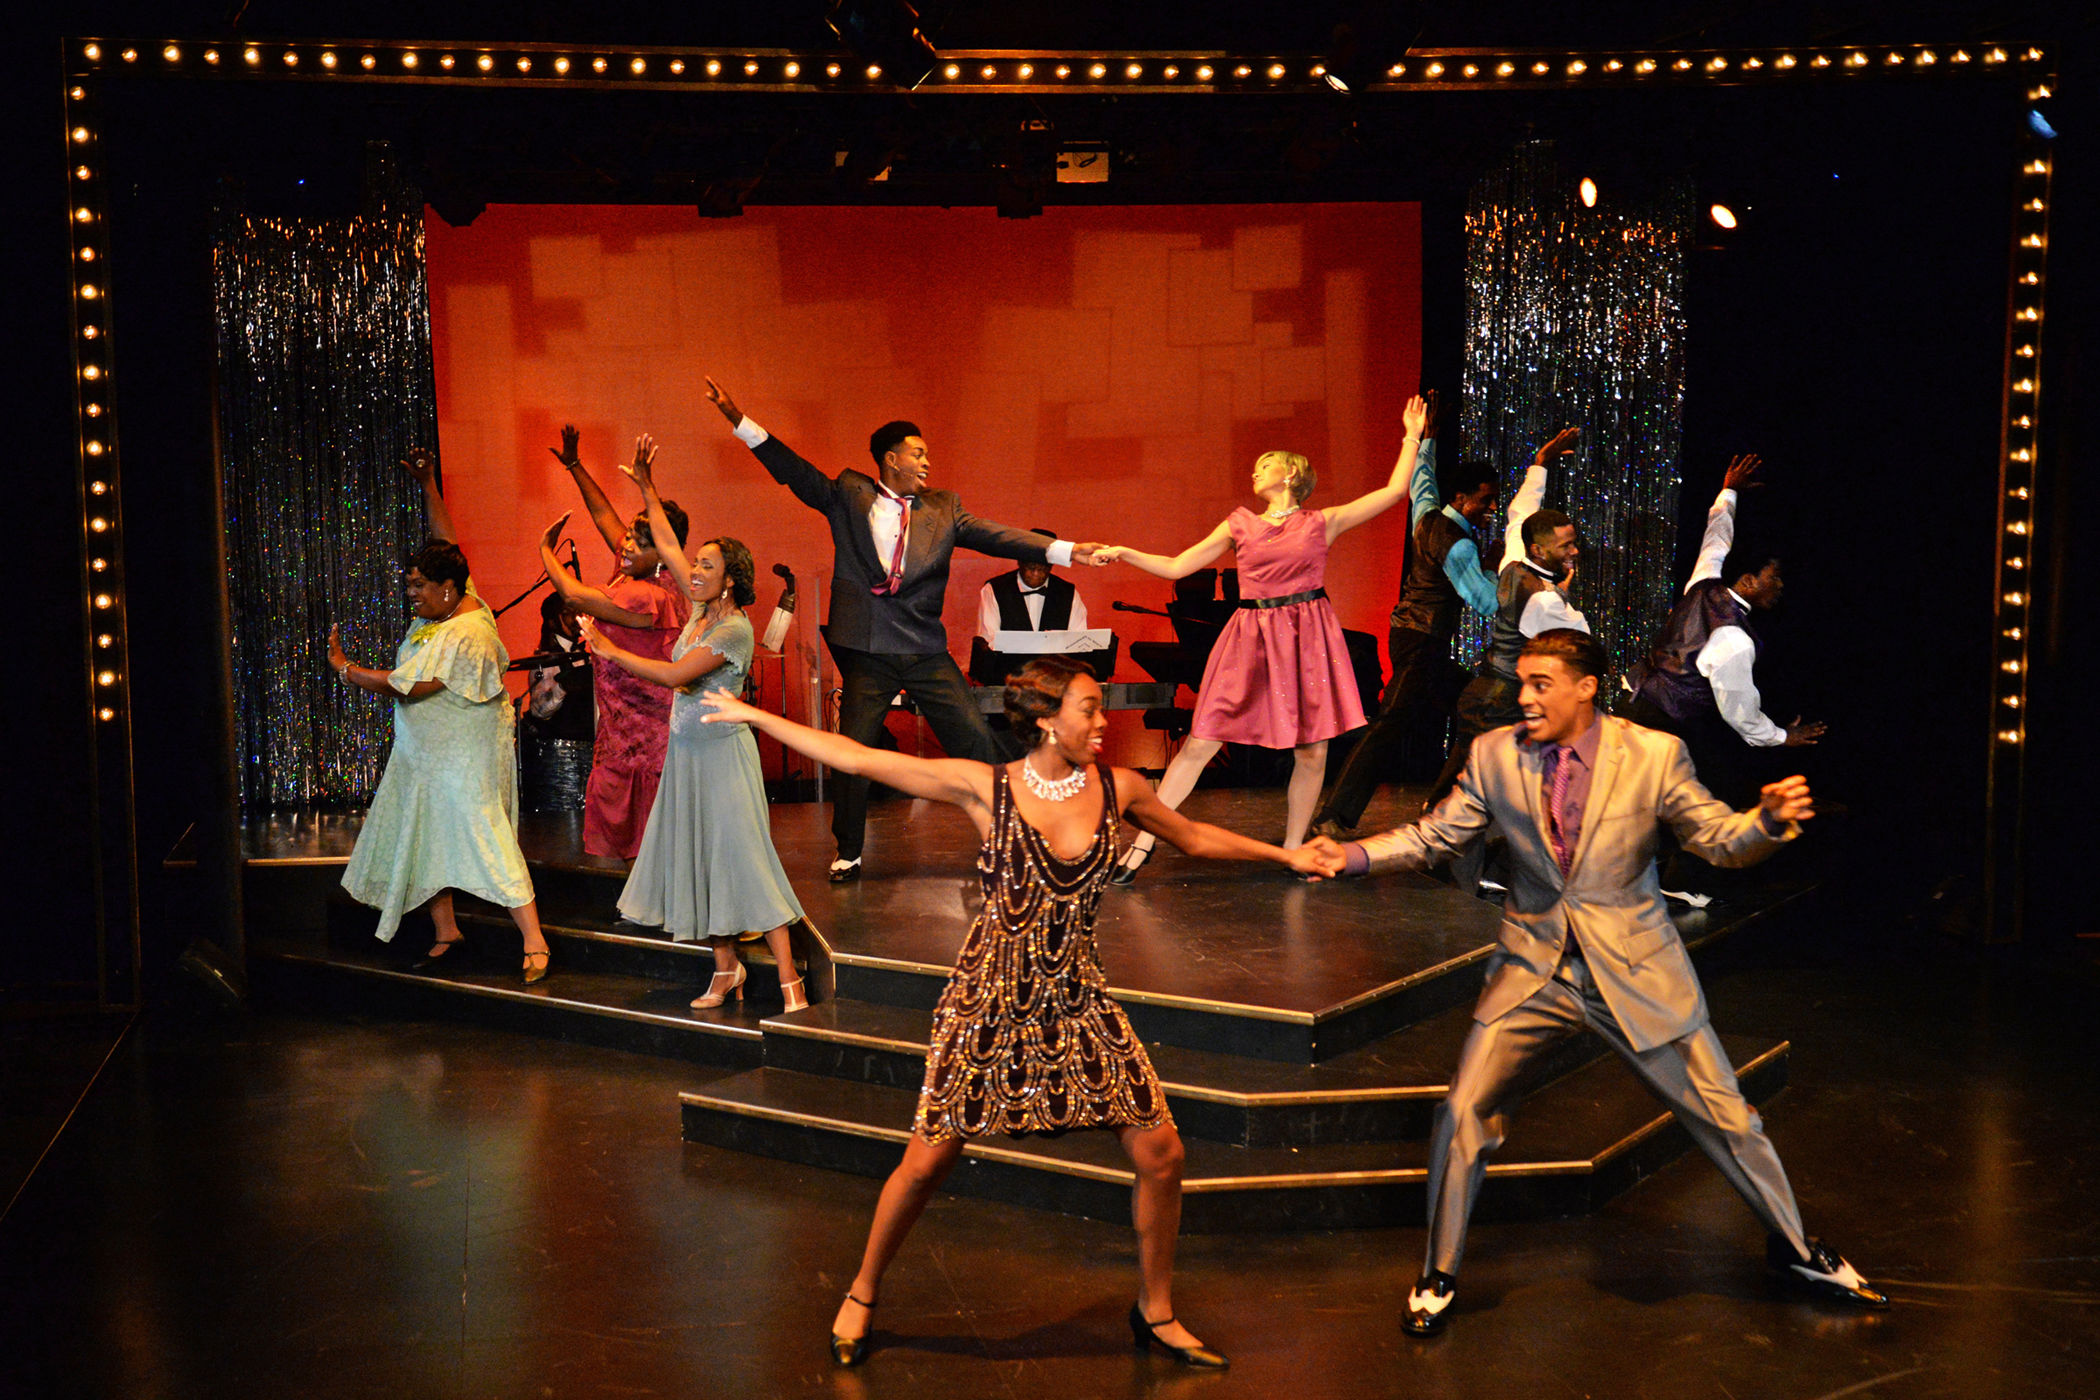 Wbtt bib 1 dancing gltwhb